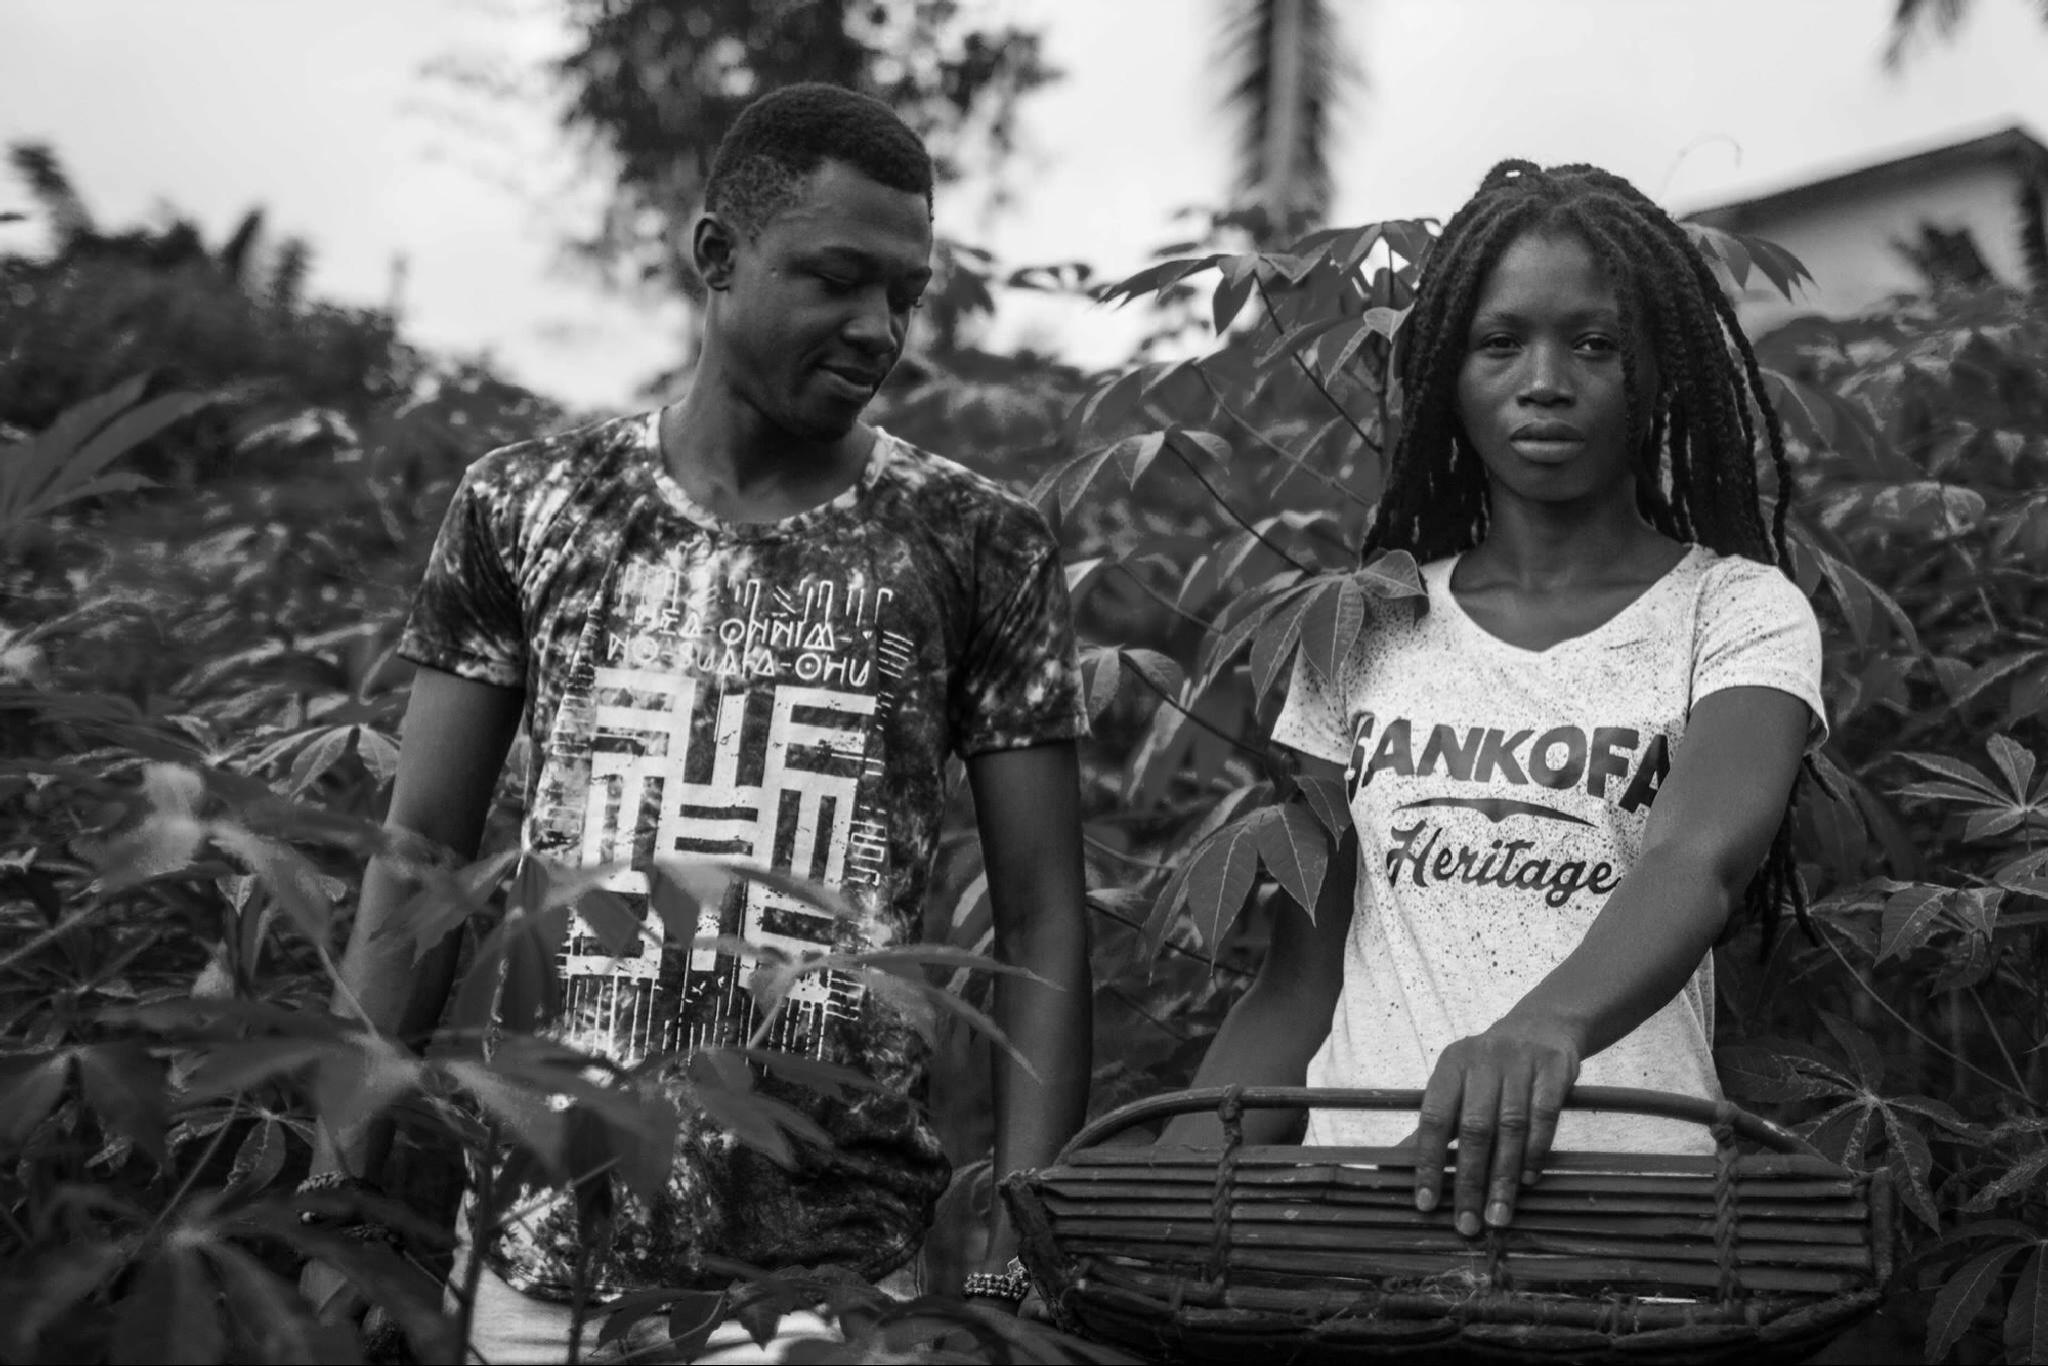 Sankofa by LIA Axel Lionel